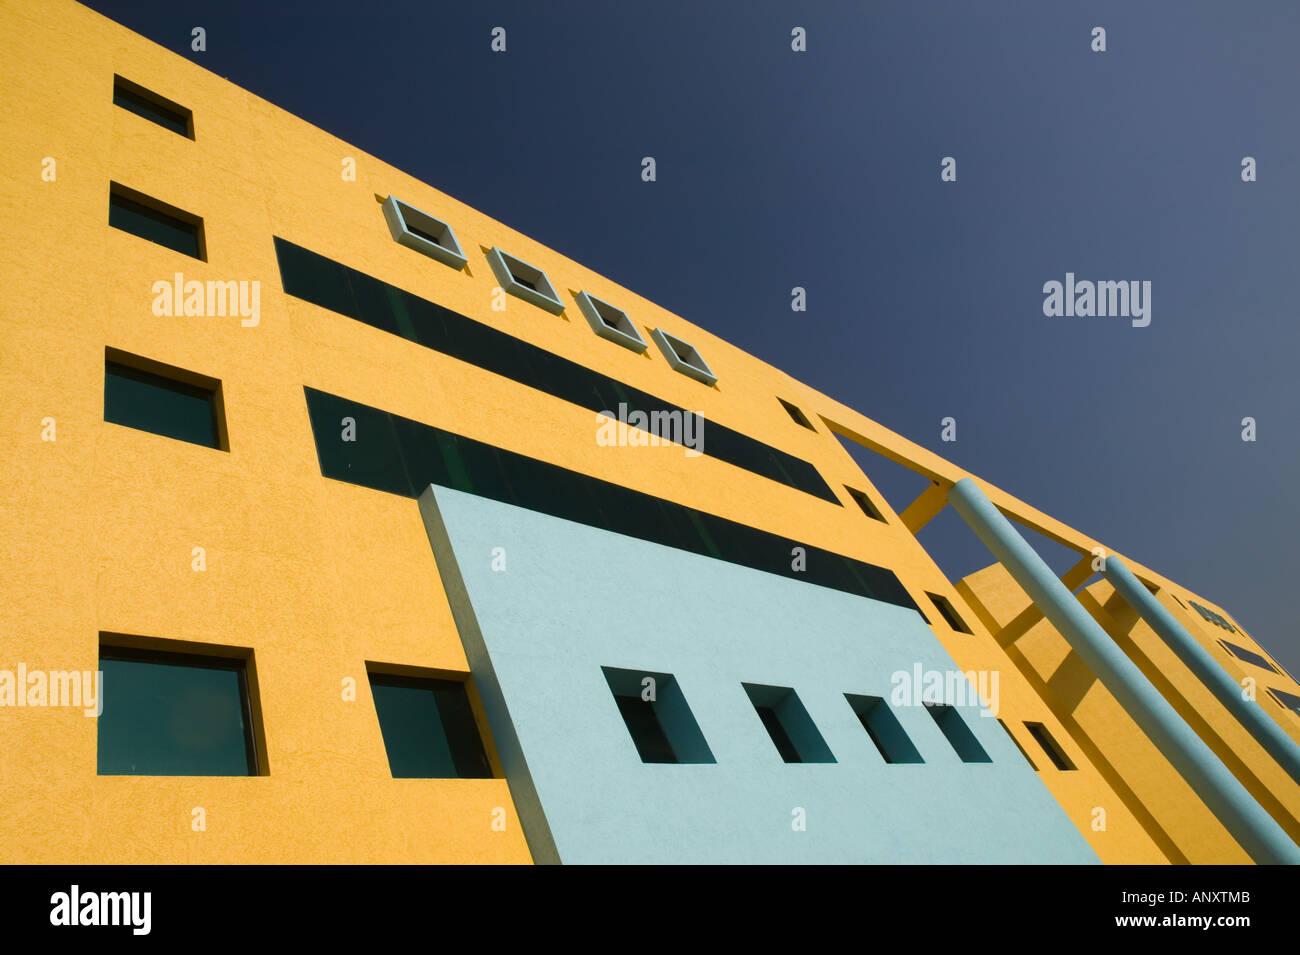 INDIA Andhra Pradesh, Hyderabad: Hitec City, centro importante di Indian Software Call Center industria. Kanbay Immagini Stock